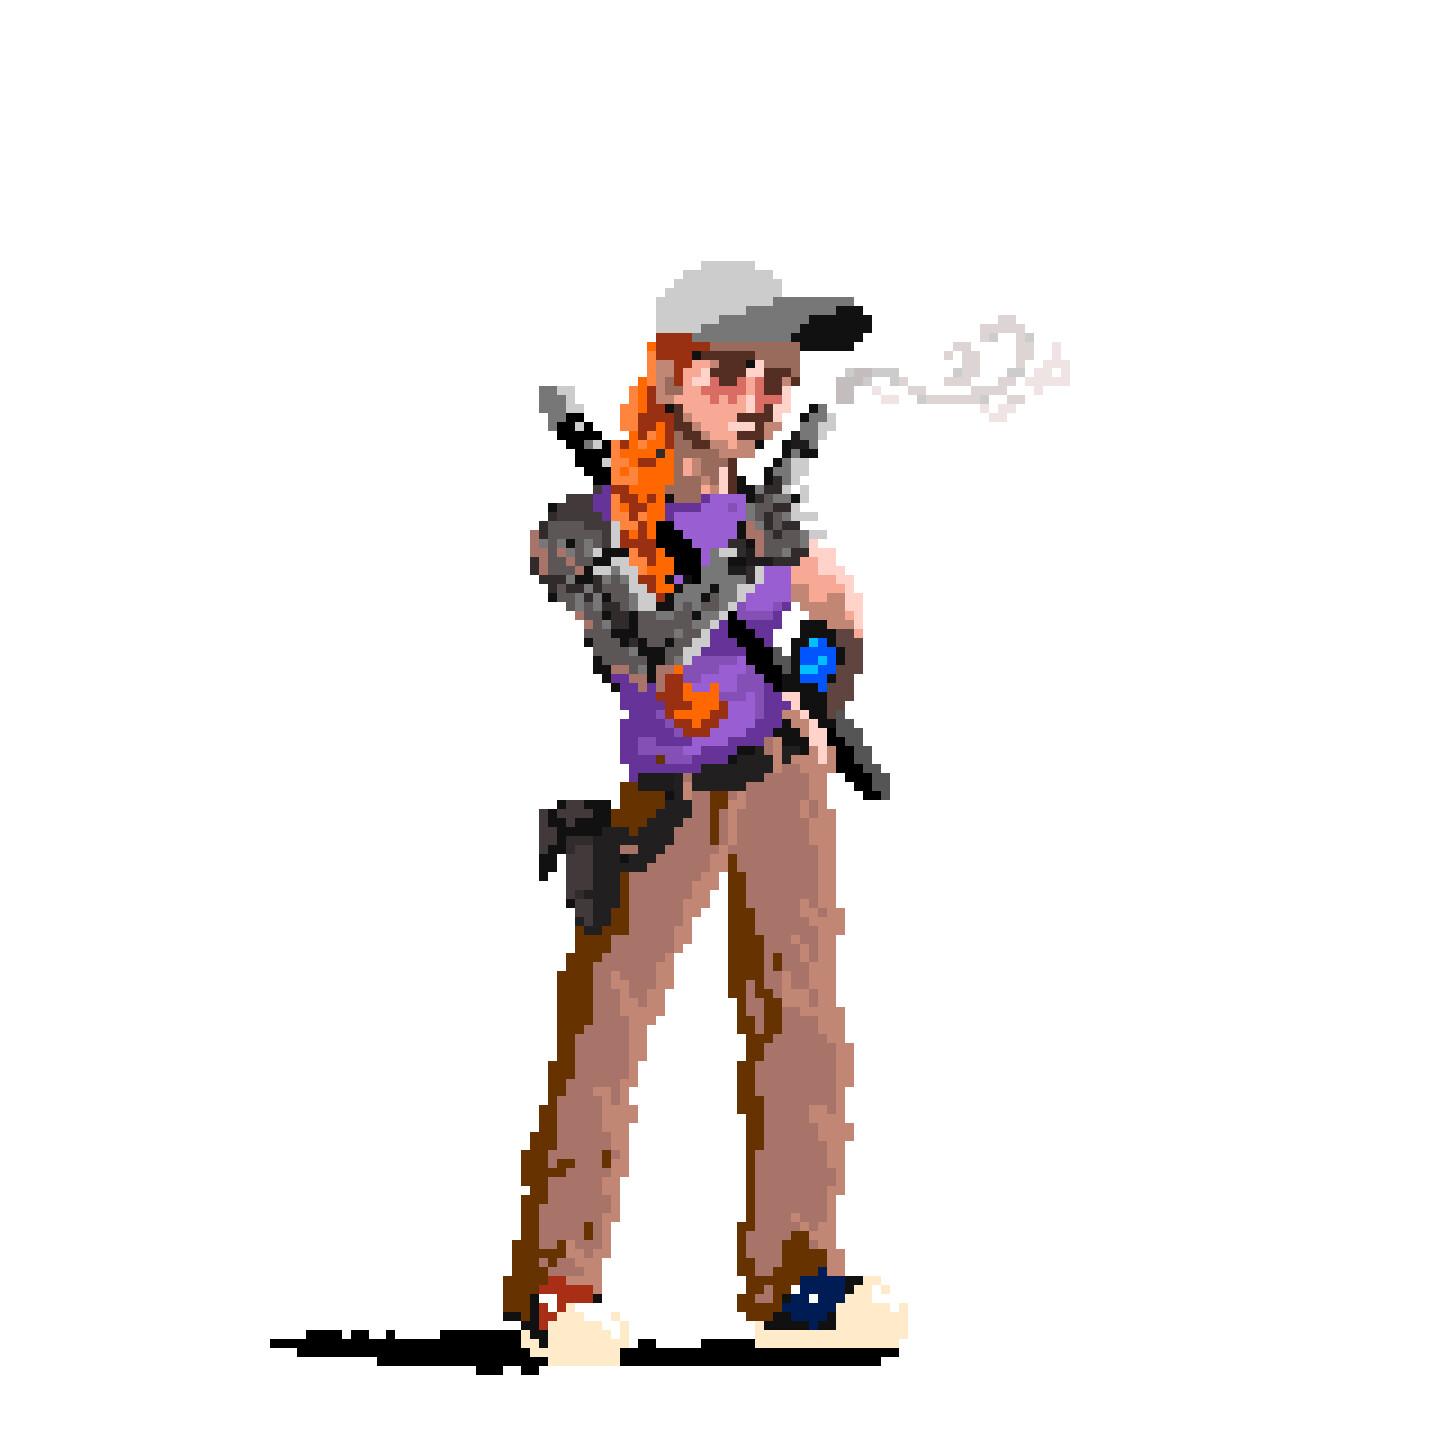 Pixel art videogame project